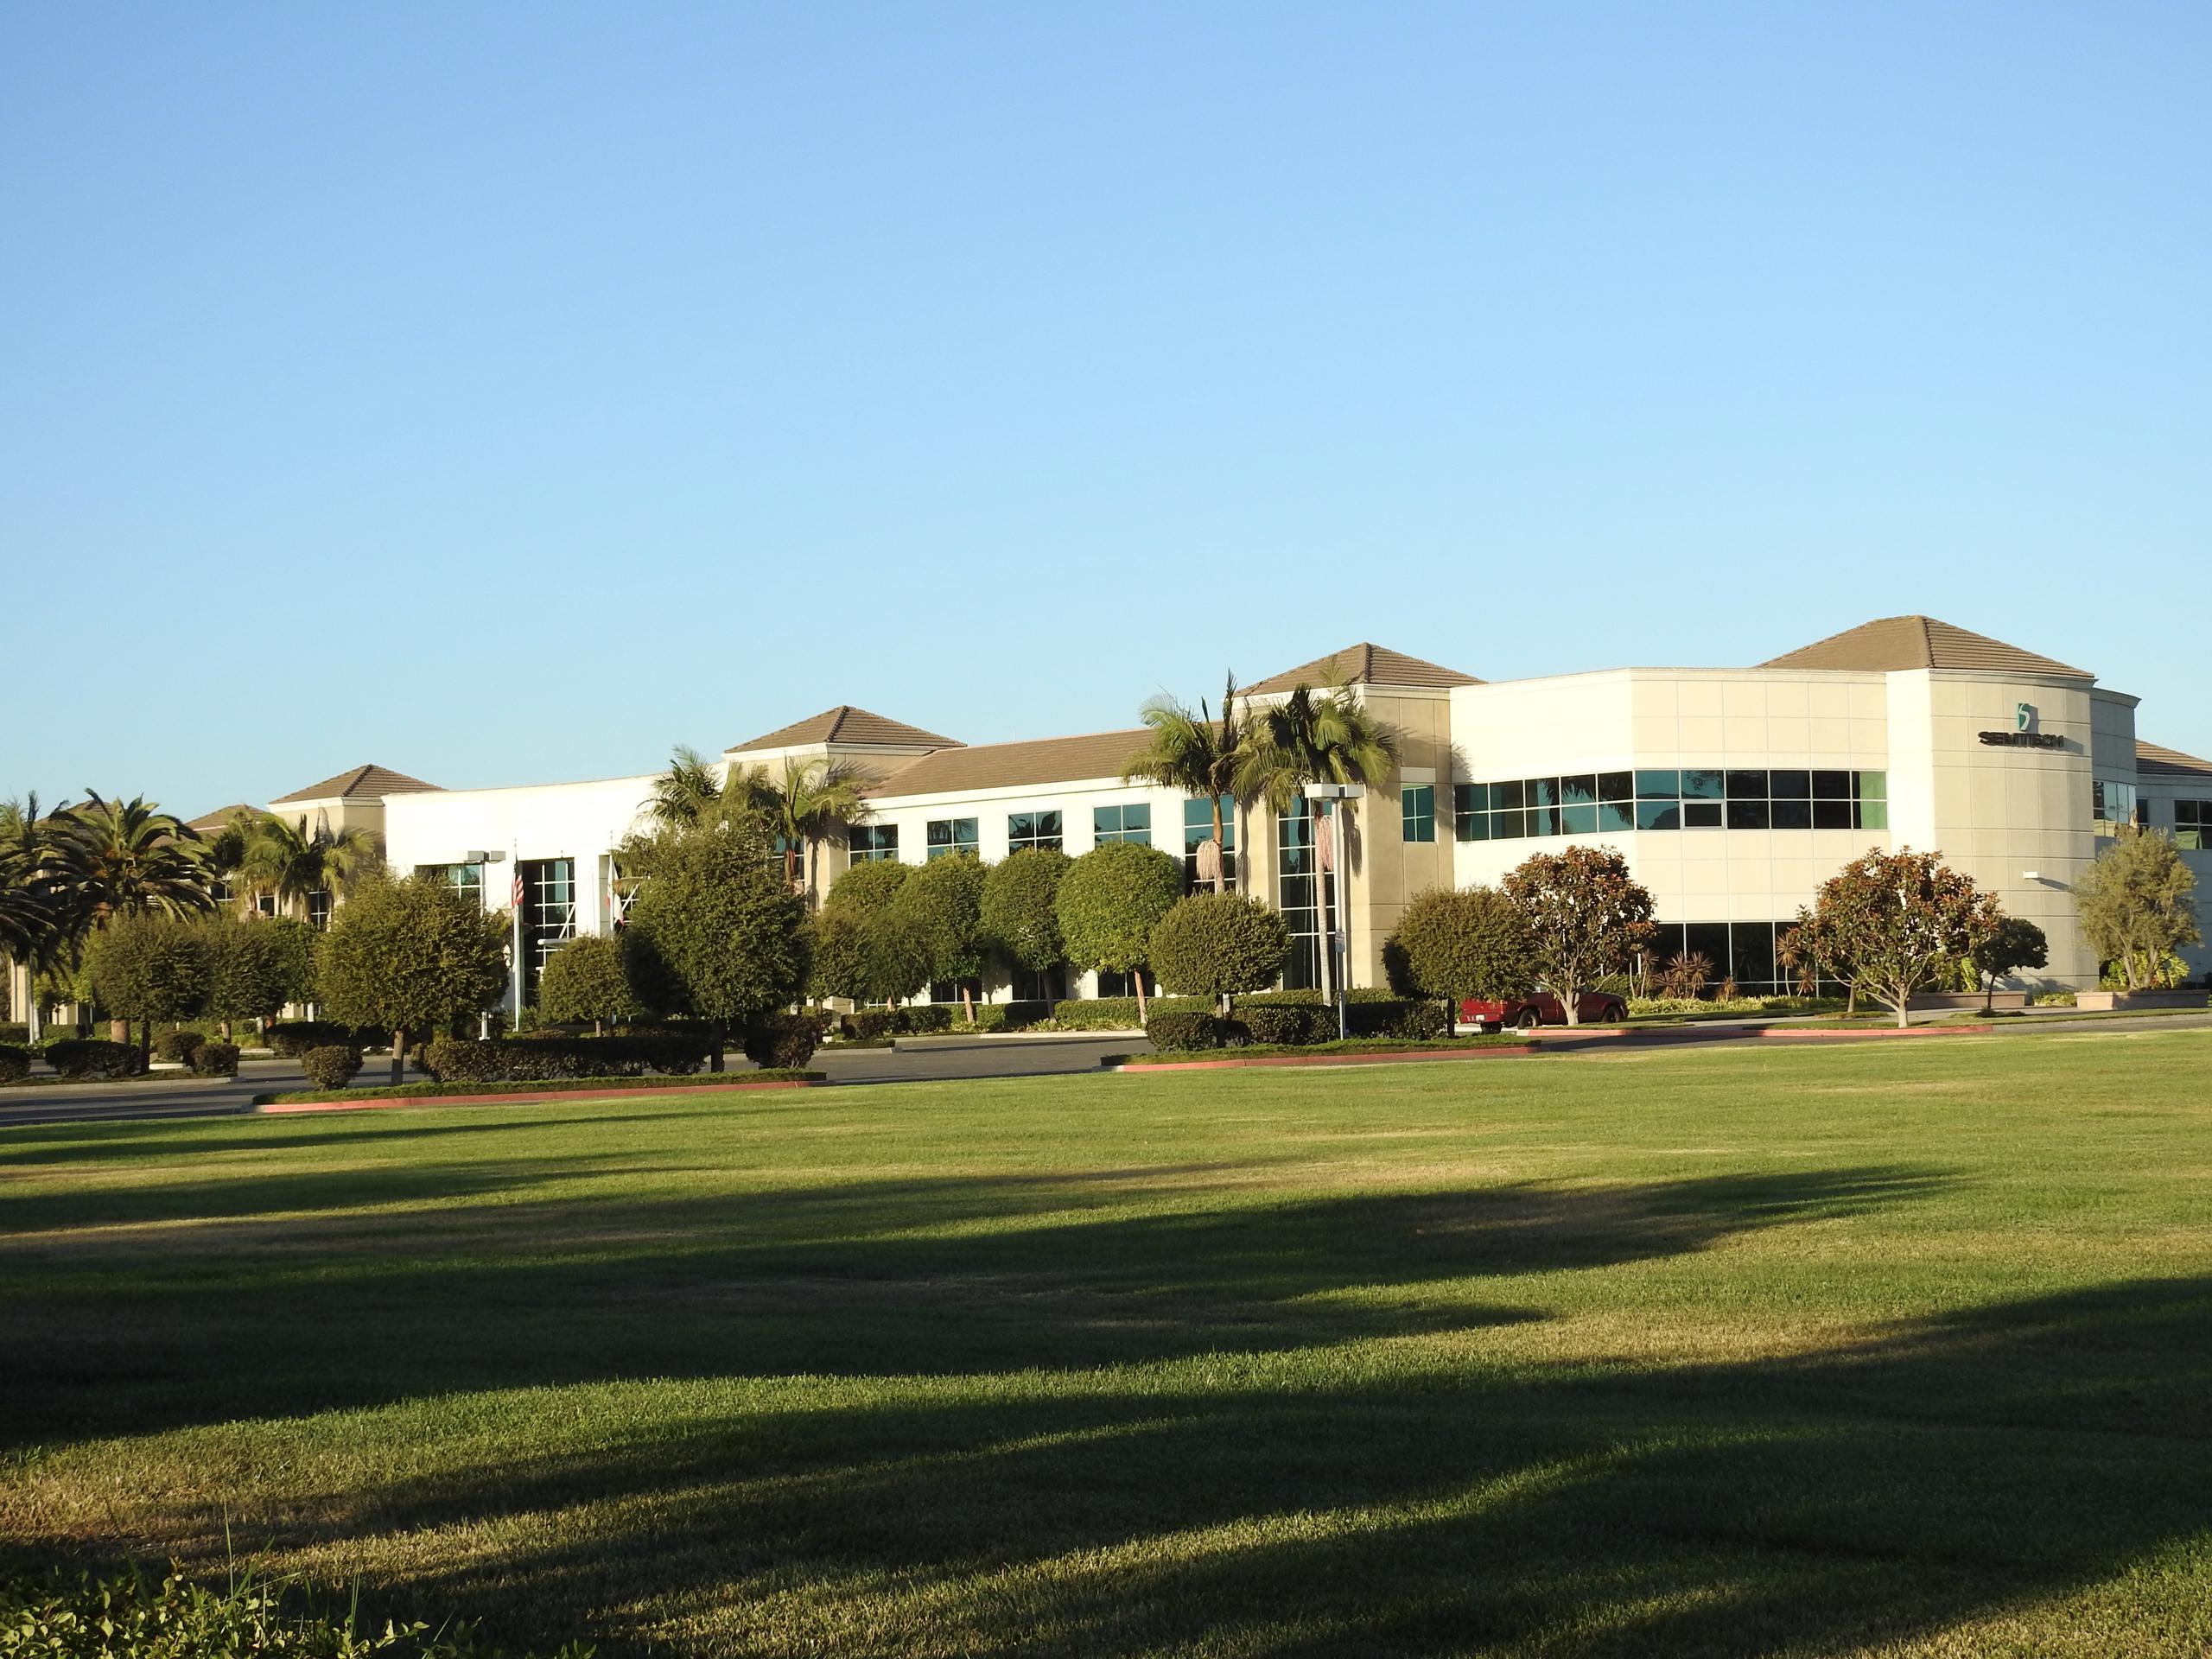 Semtech's corporate headquarters in Camarillo, California.